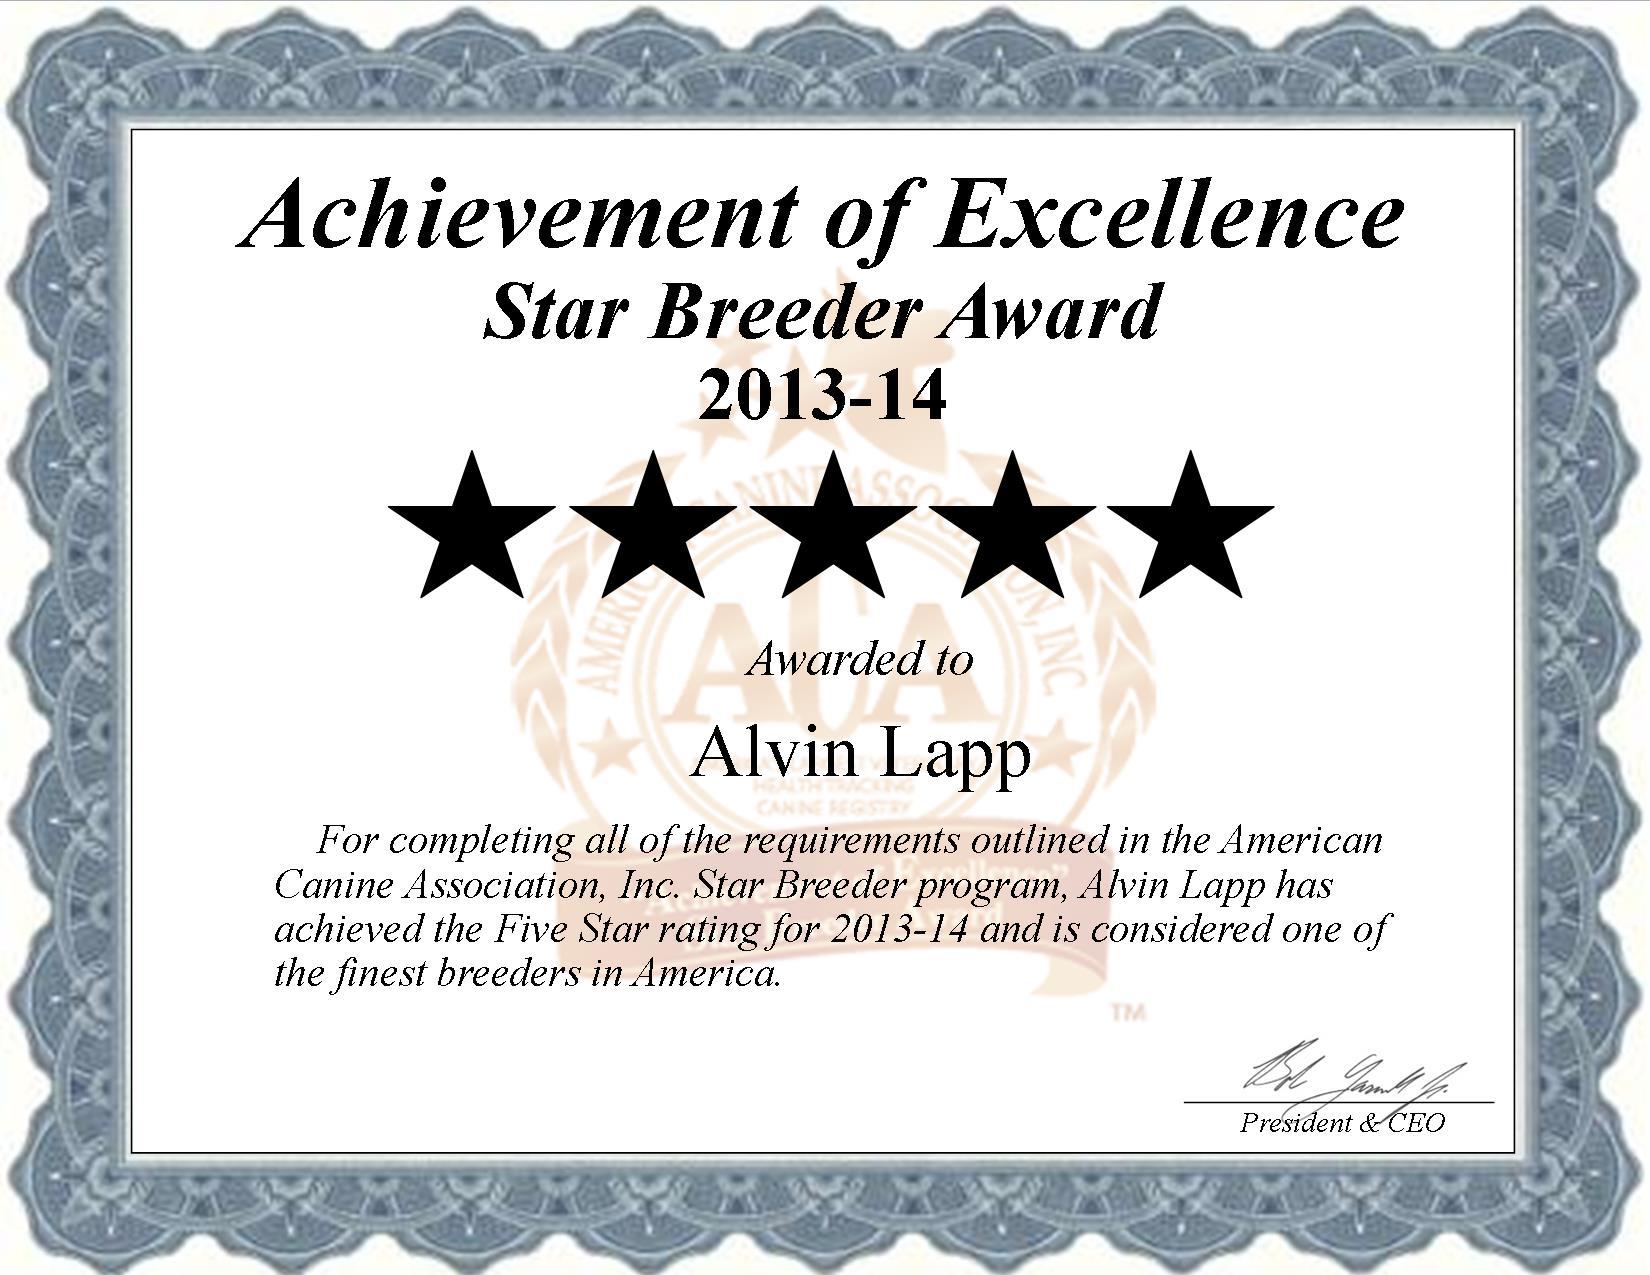 Alvin Lapp, Alvin, lapp, lapp Kennel, gap, pa, pennsylvania, breeder, star breeder, starbreeder, 4 star, dog, puppy, puppies, four star, kennel